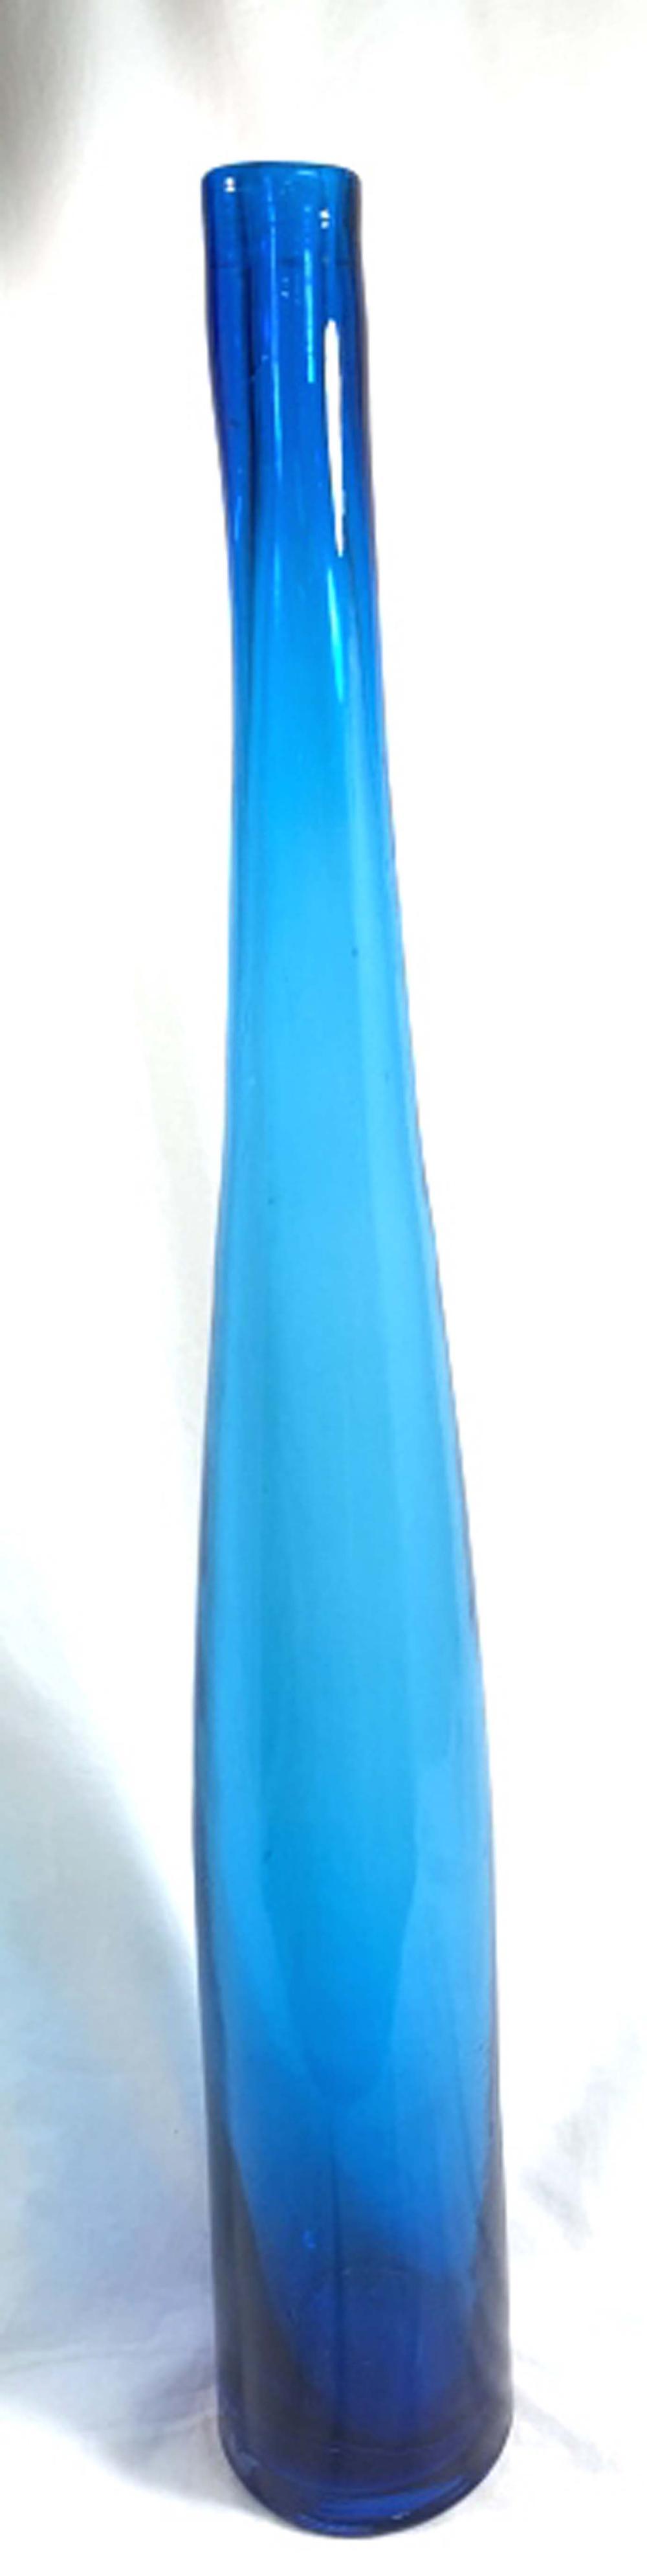 AMAZING TALL TEAL BLUE ITALIAN ART GLASS VASE